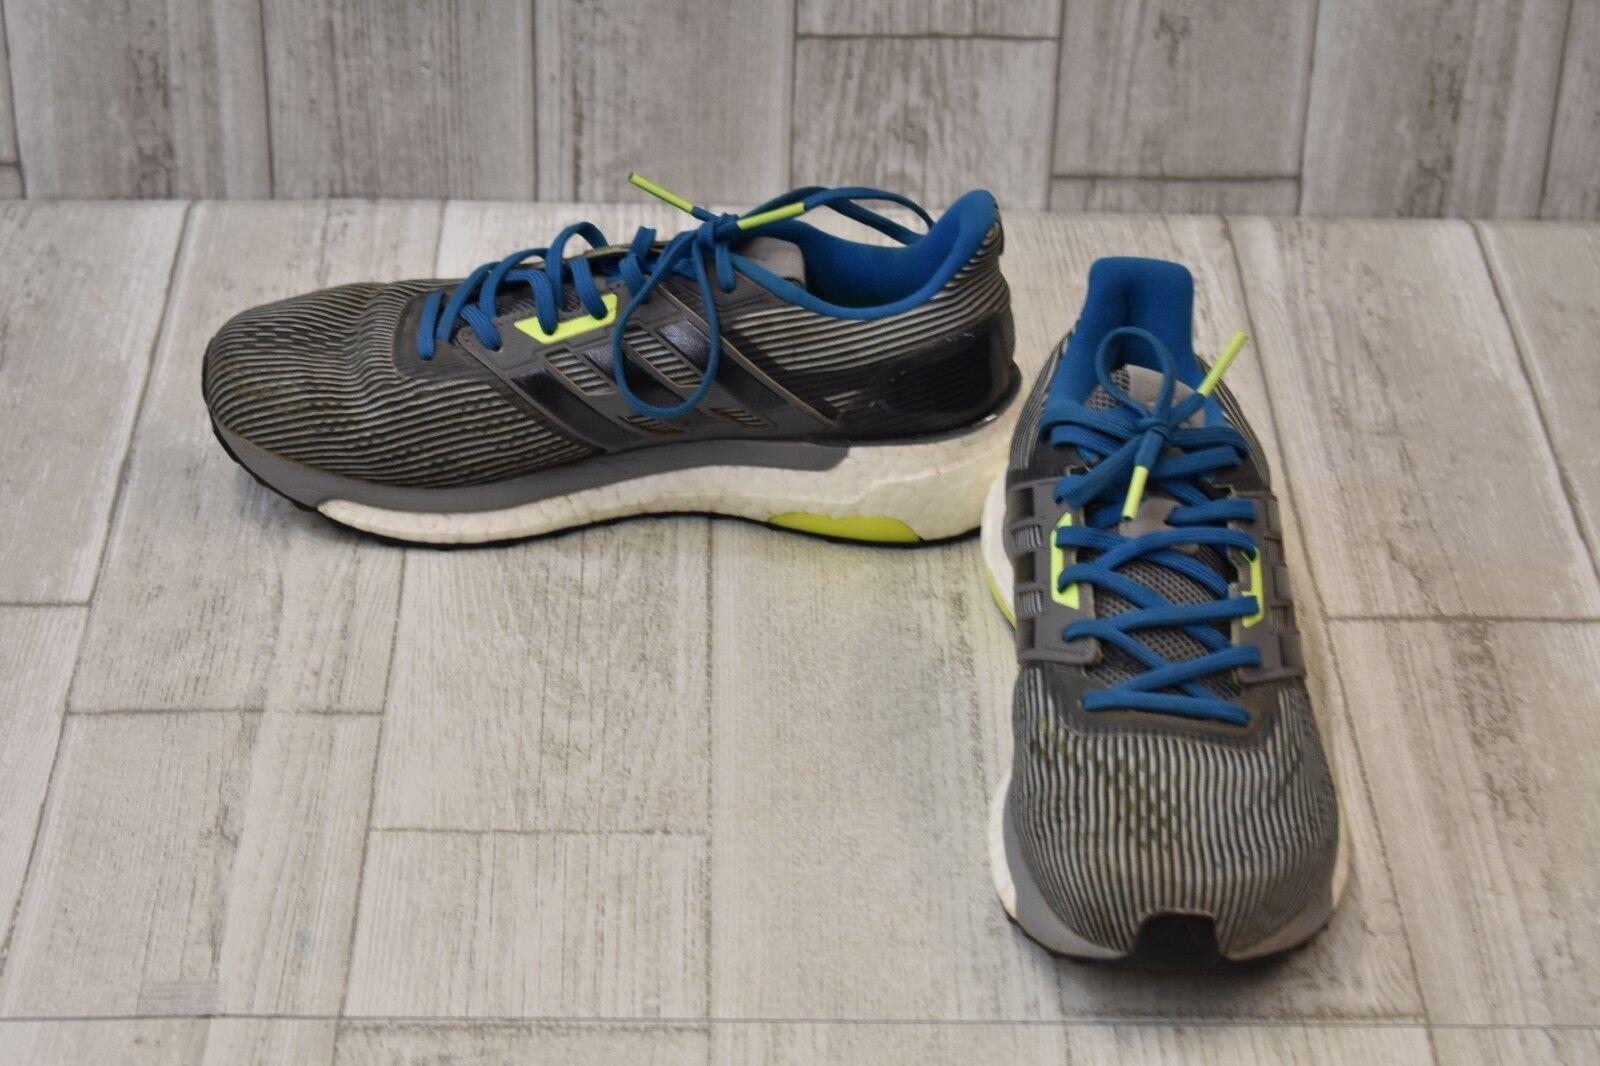 adidas Supernova Athletic Shoes - Men's Size 9 - Multicolor